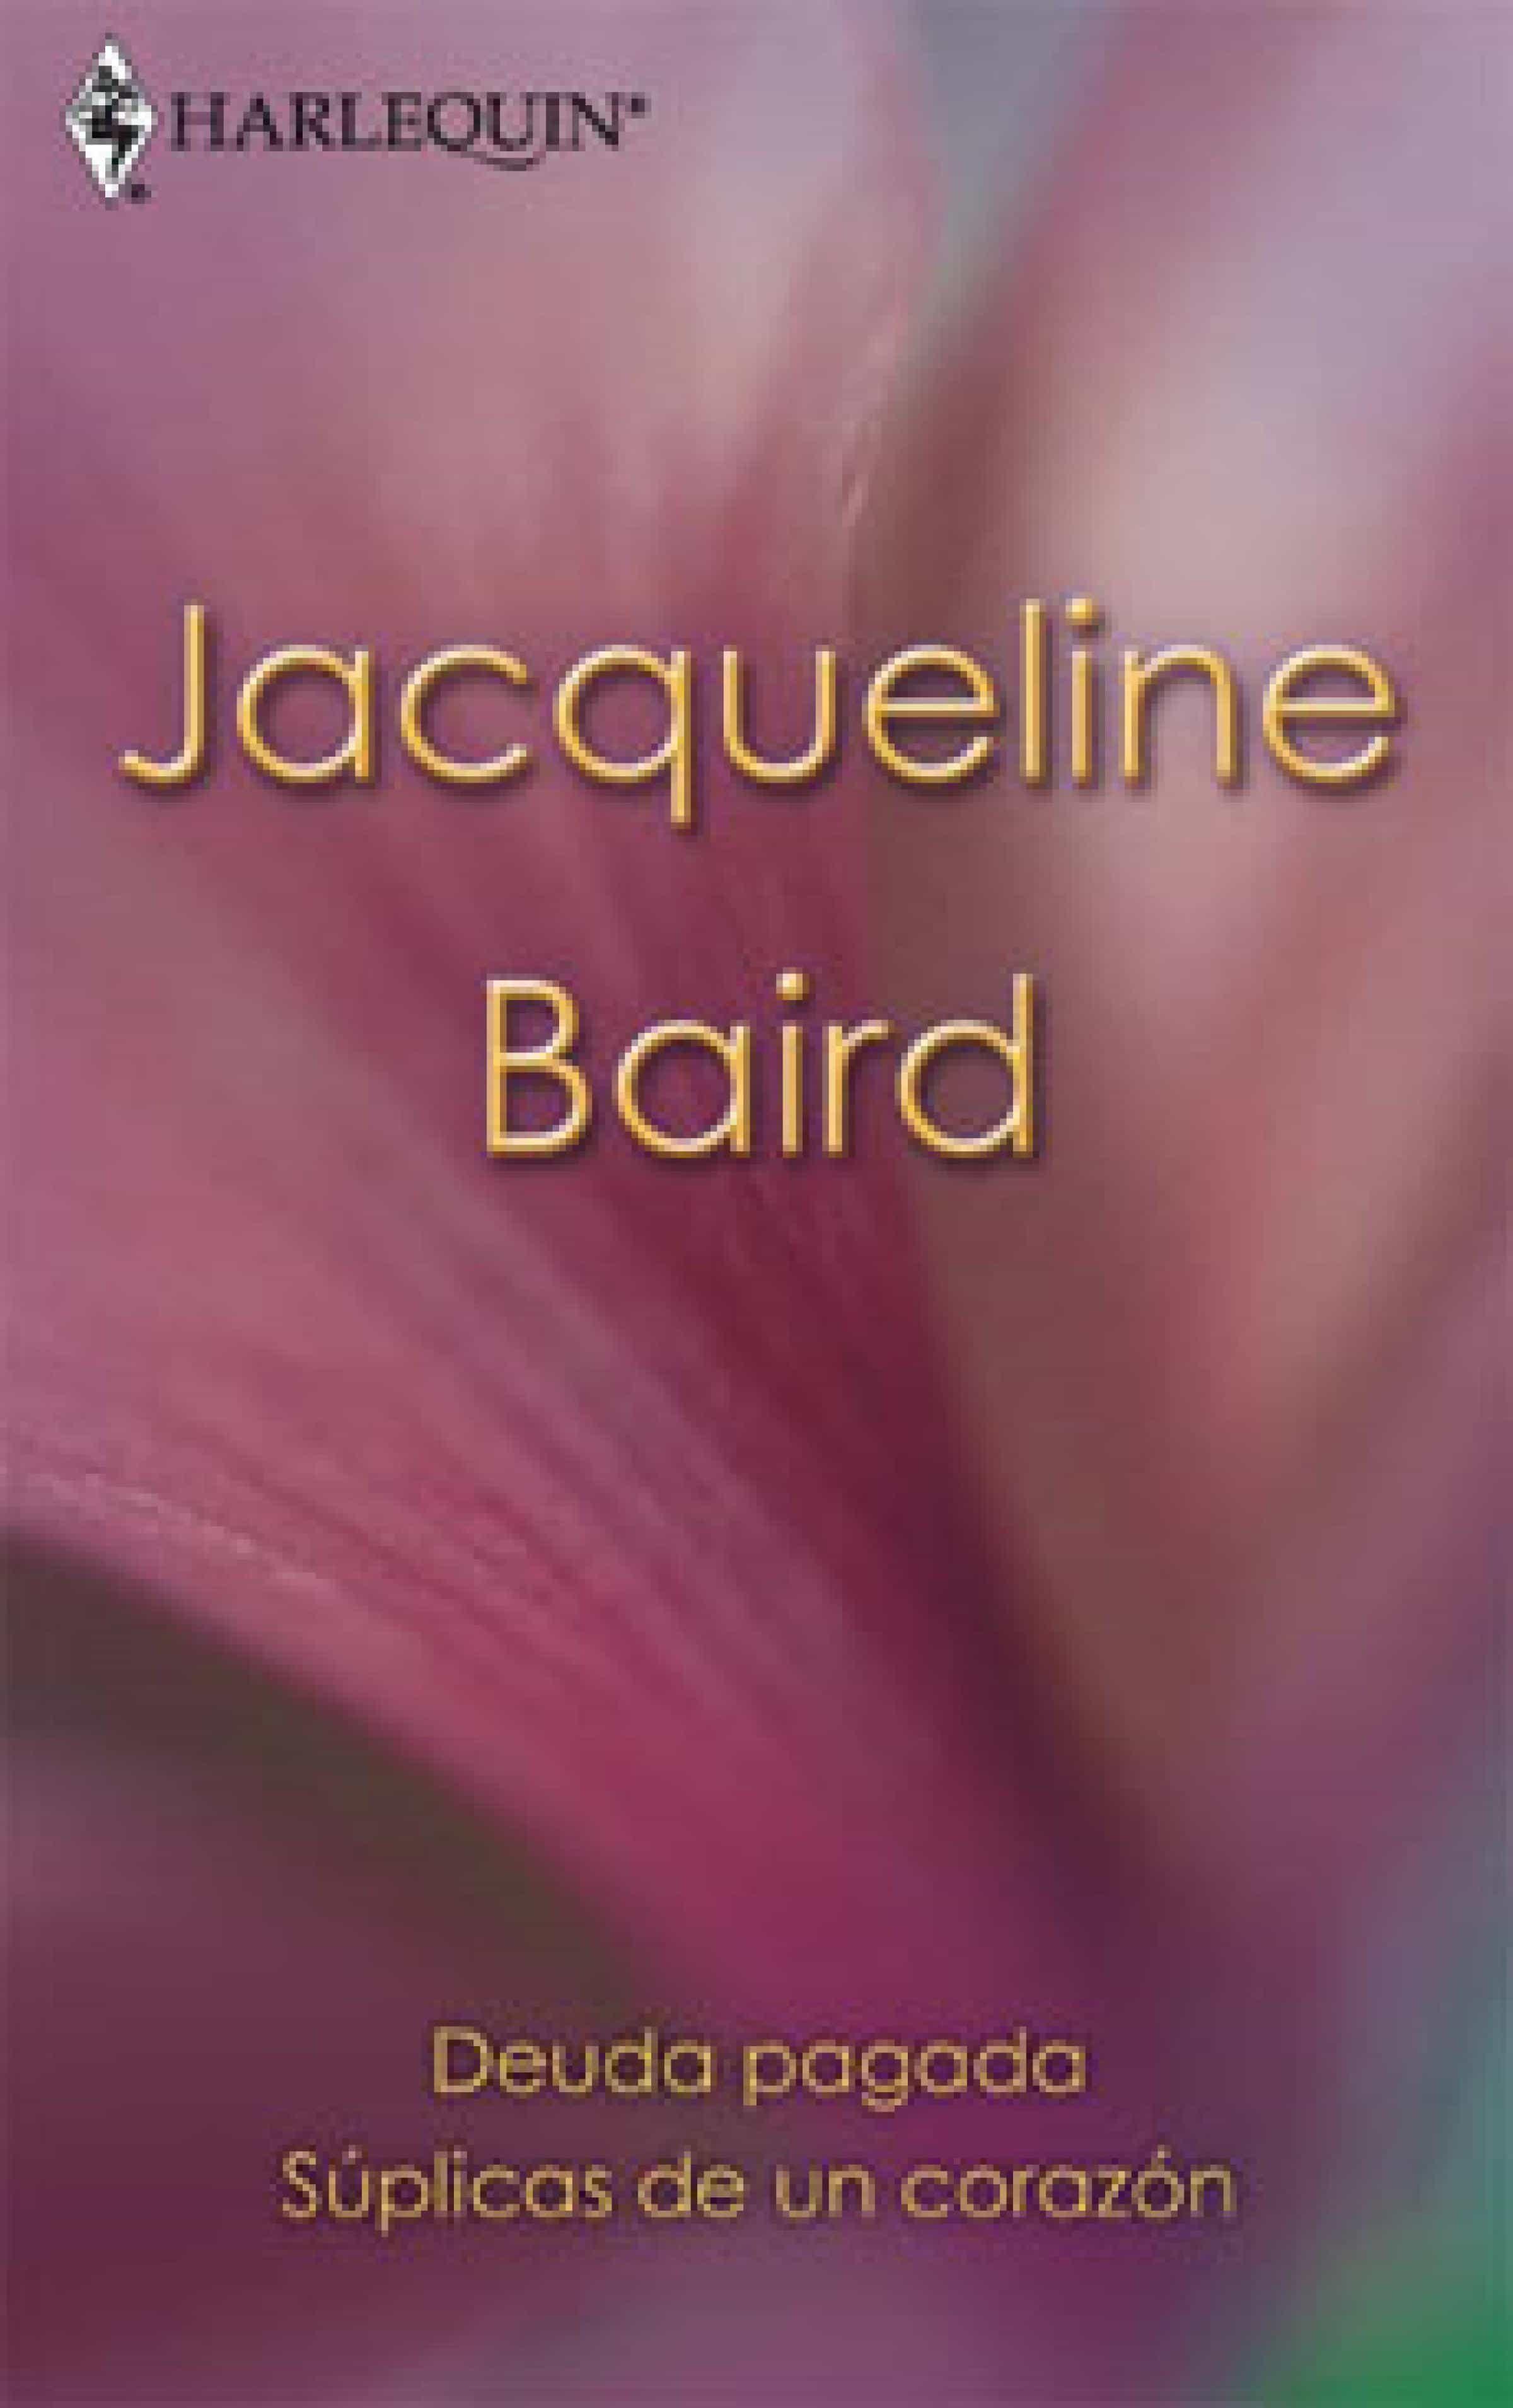 deuda pagada jacqueline baird